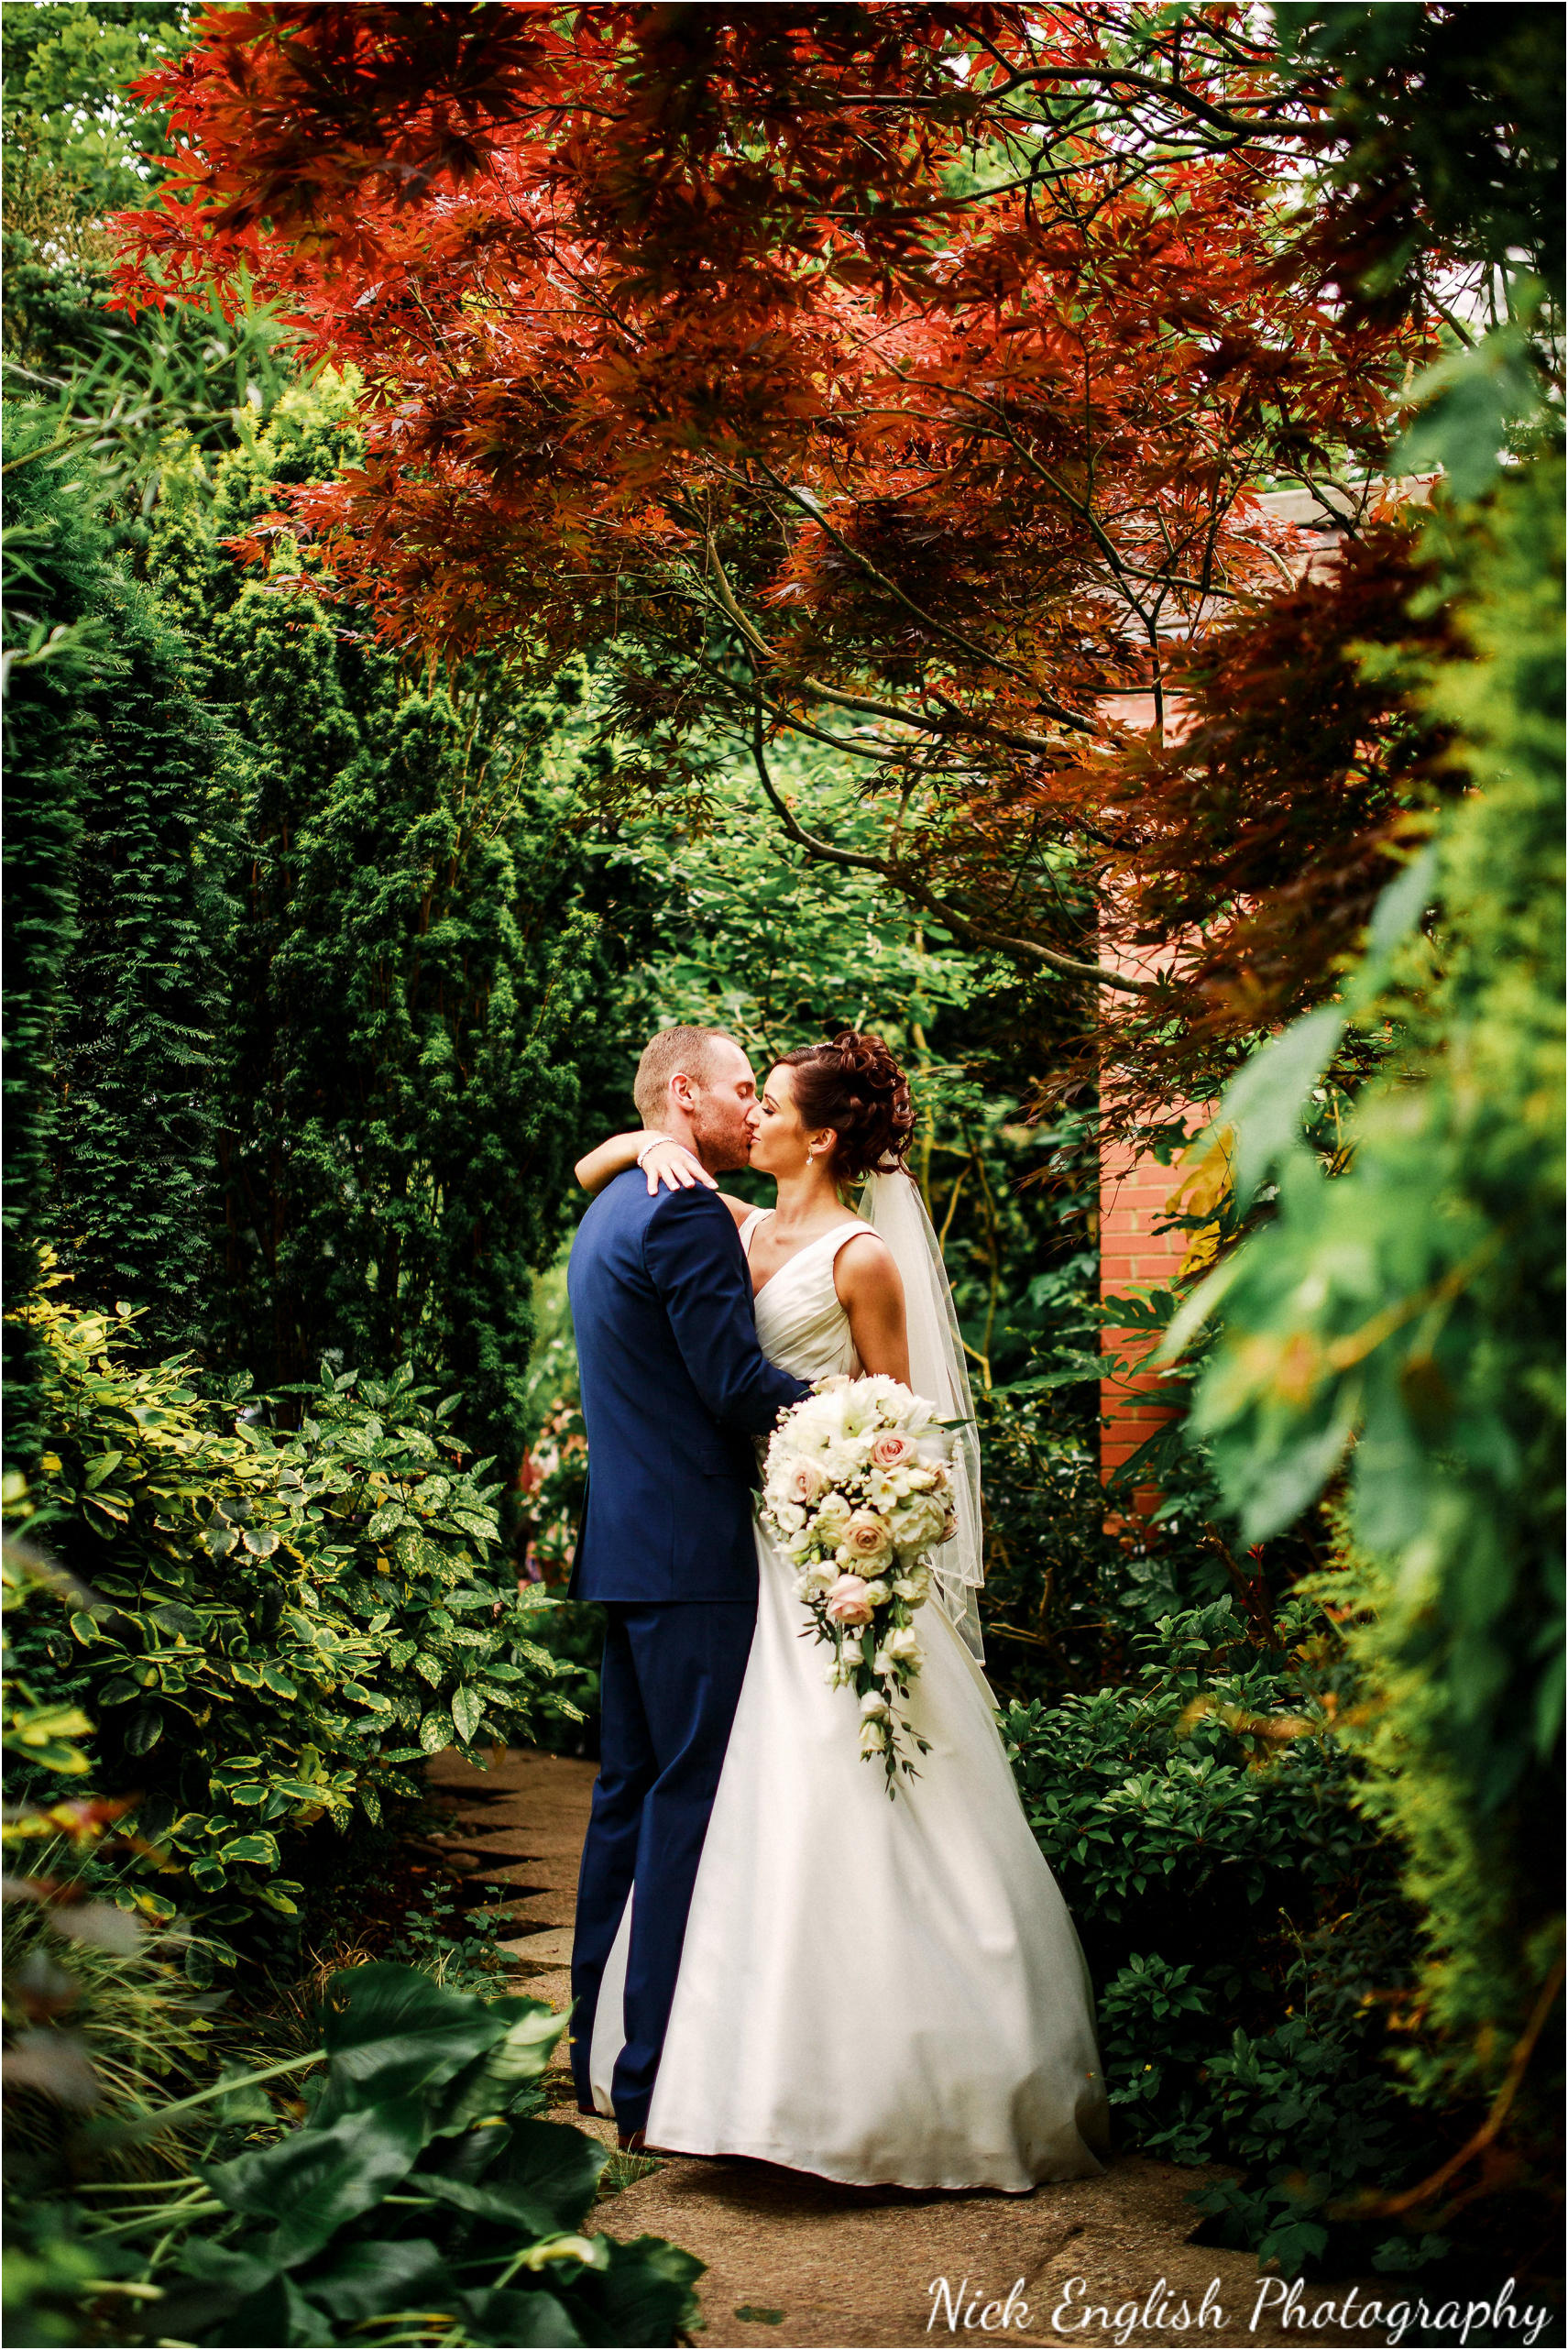 Emily David Wedding Photographs at Barton Grange Preston by Nick English Photography 143jpg.jpeg